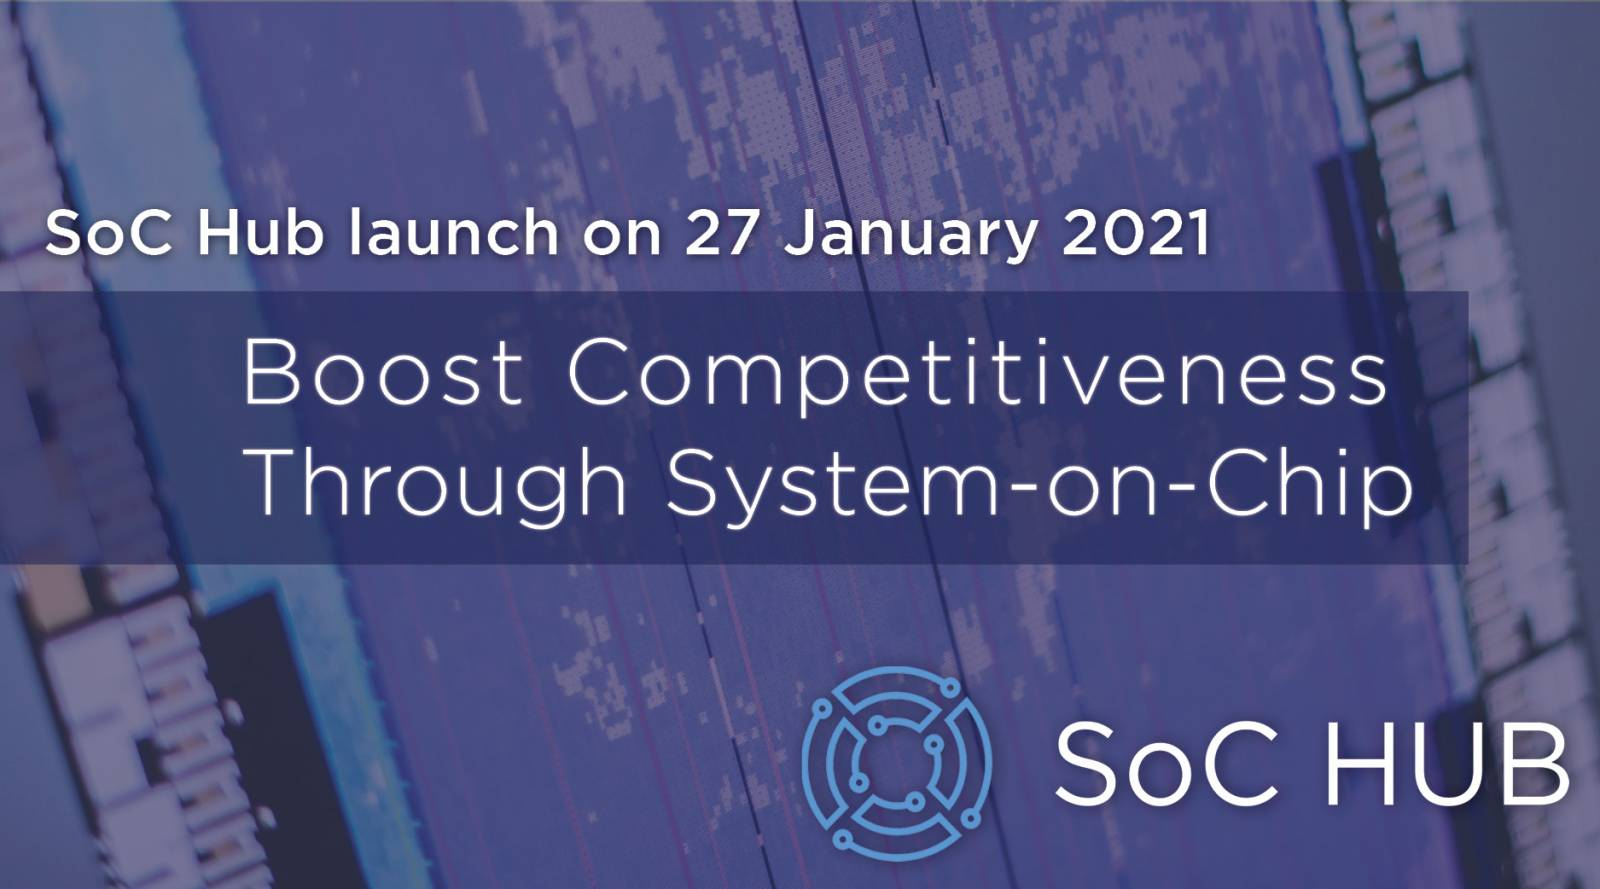 SoC Hub launch 27 January 2021